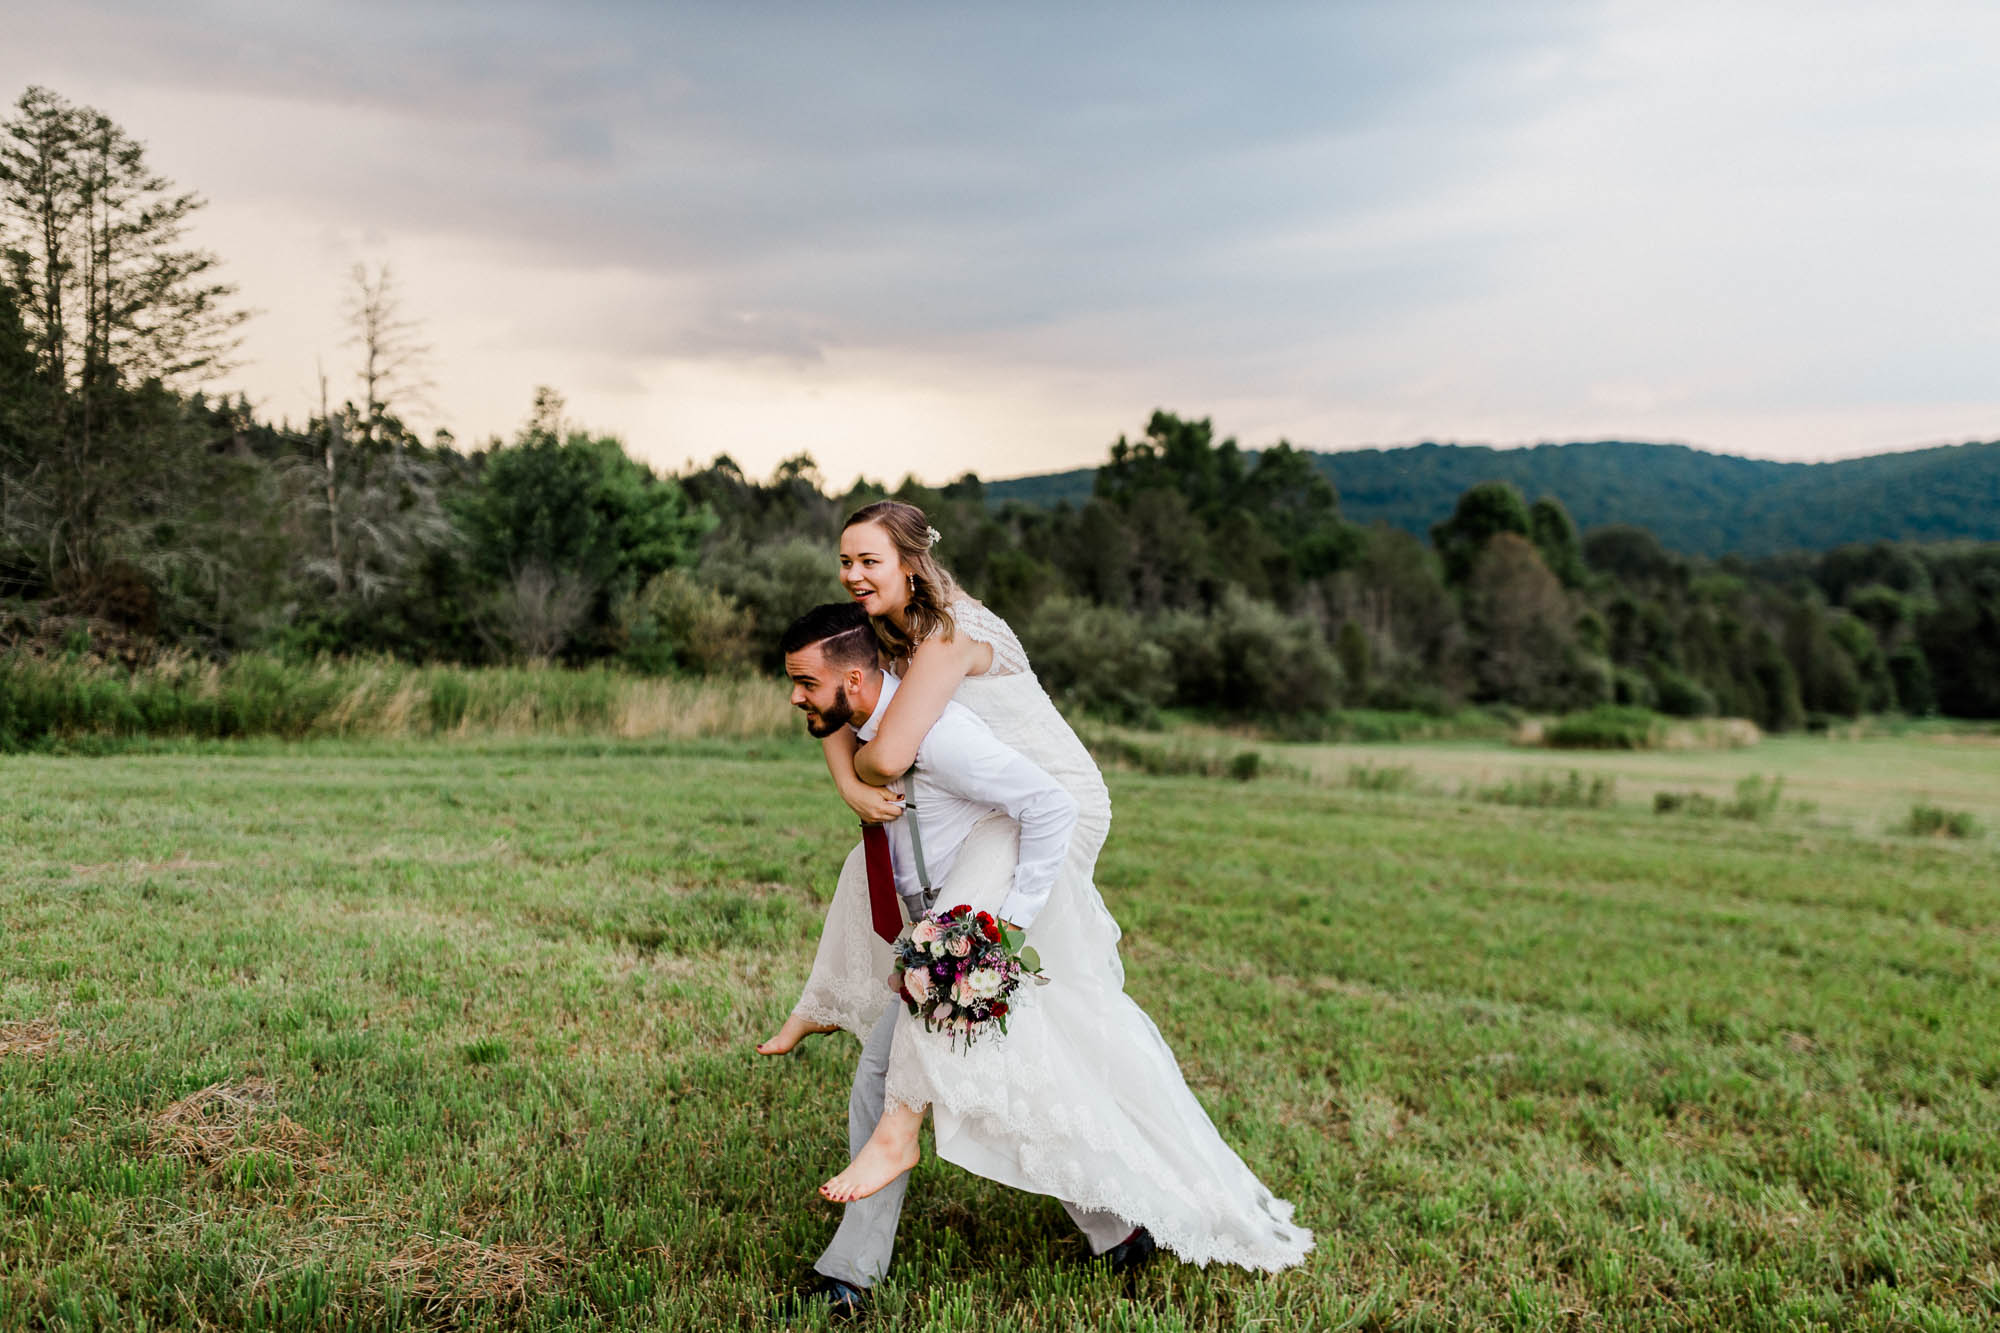 Stillwater-Christian_Church_Wedding-2418.jpg